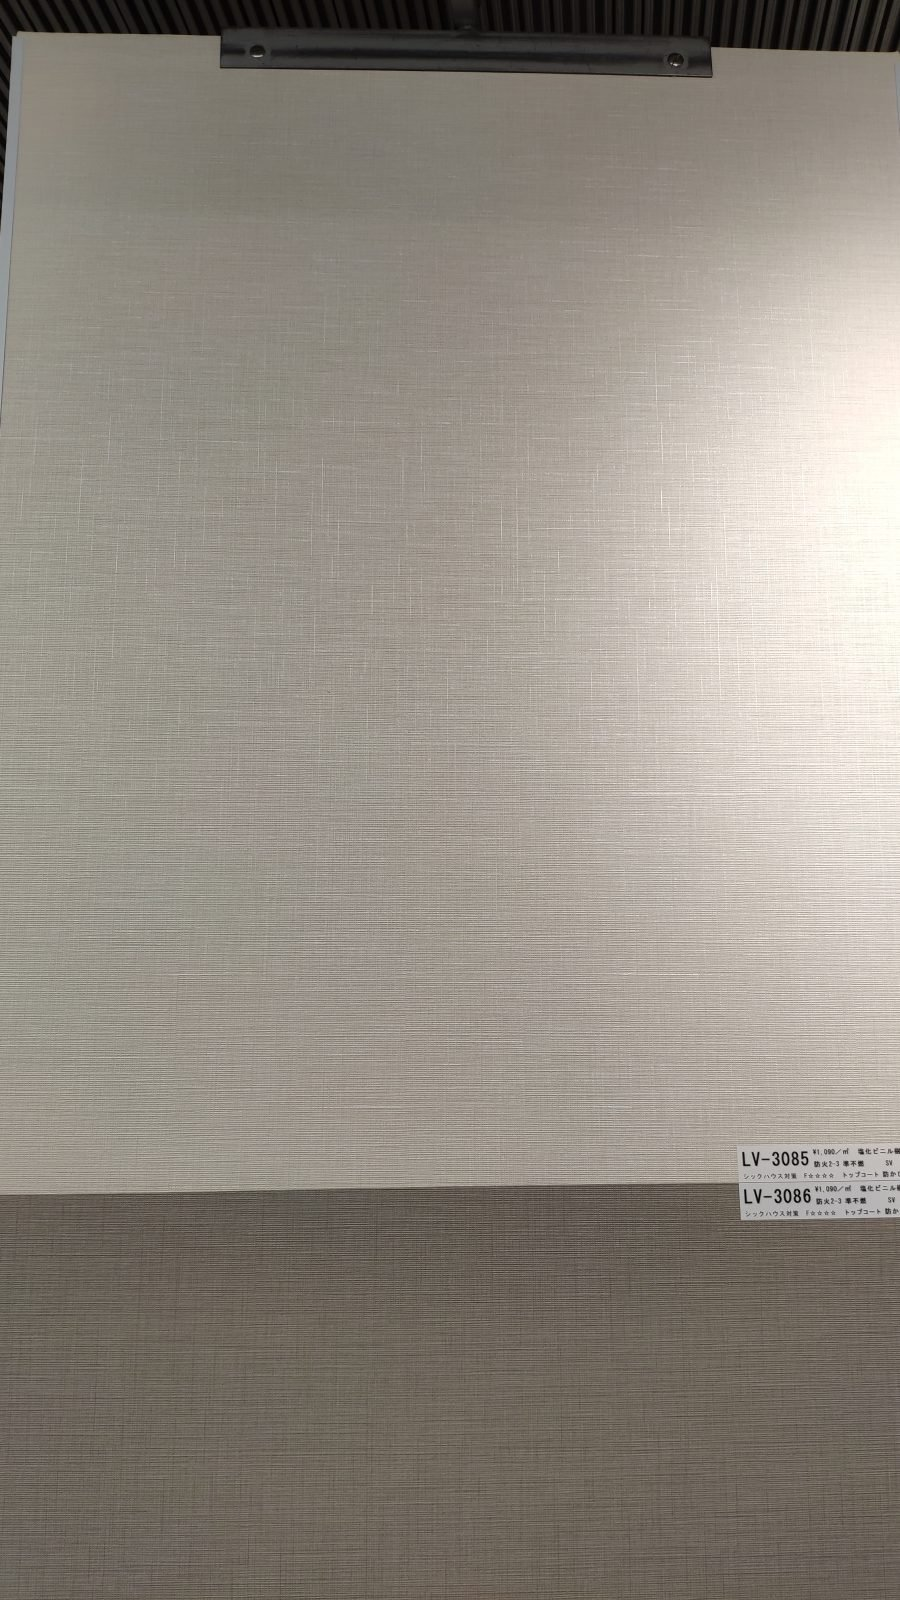 LV-3085(LTS444) / LV-3086